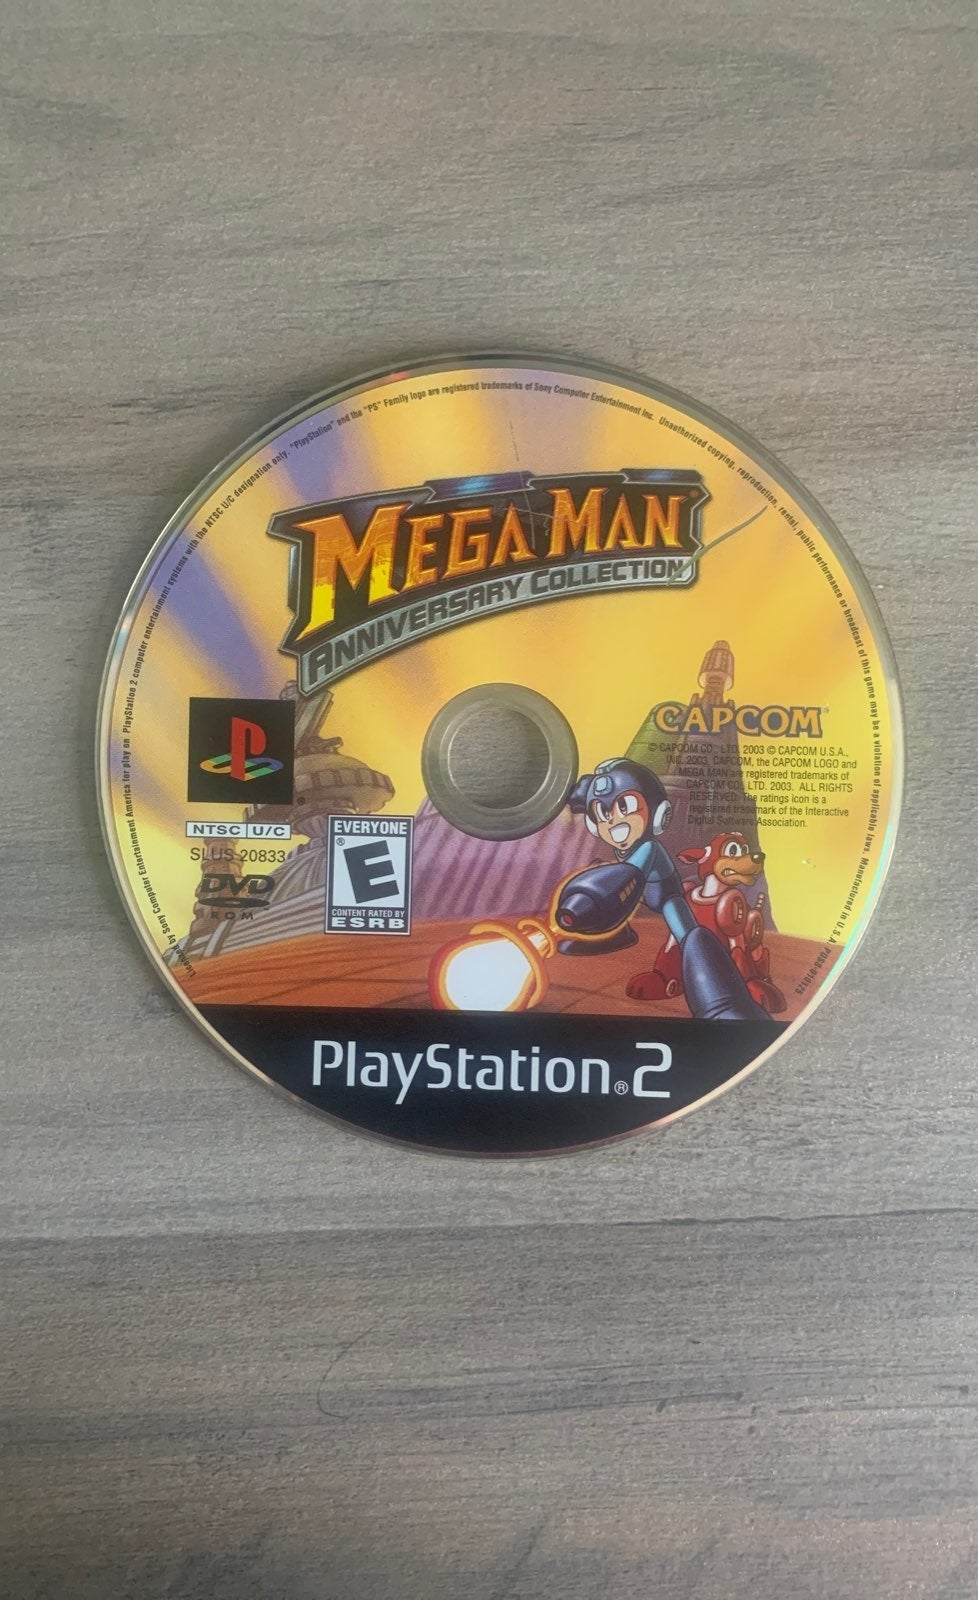 Mega man anniversary collectionPS2